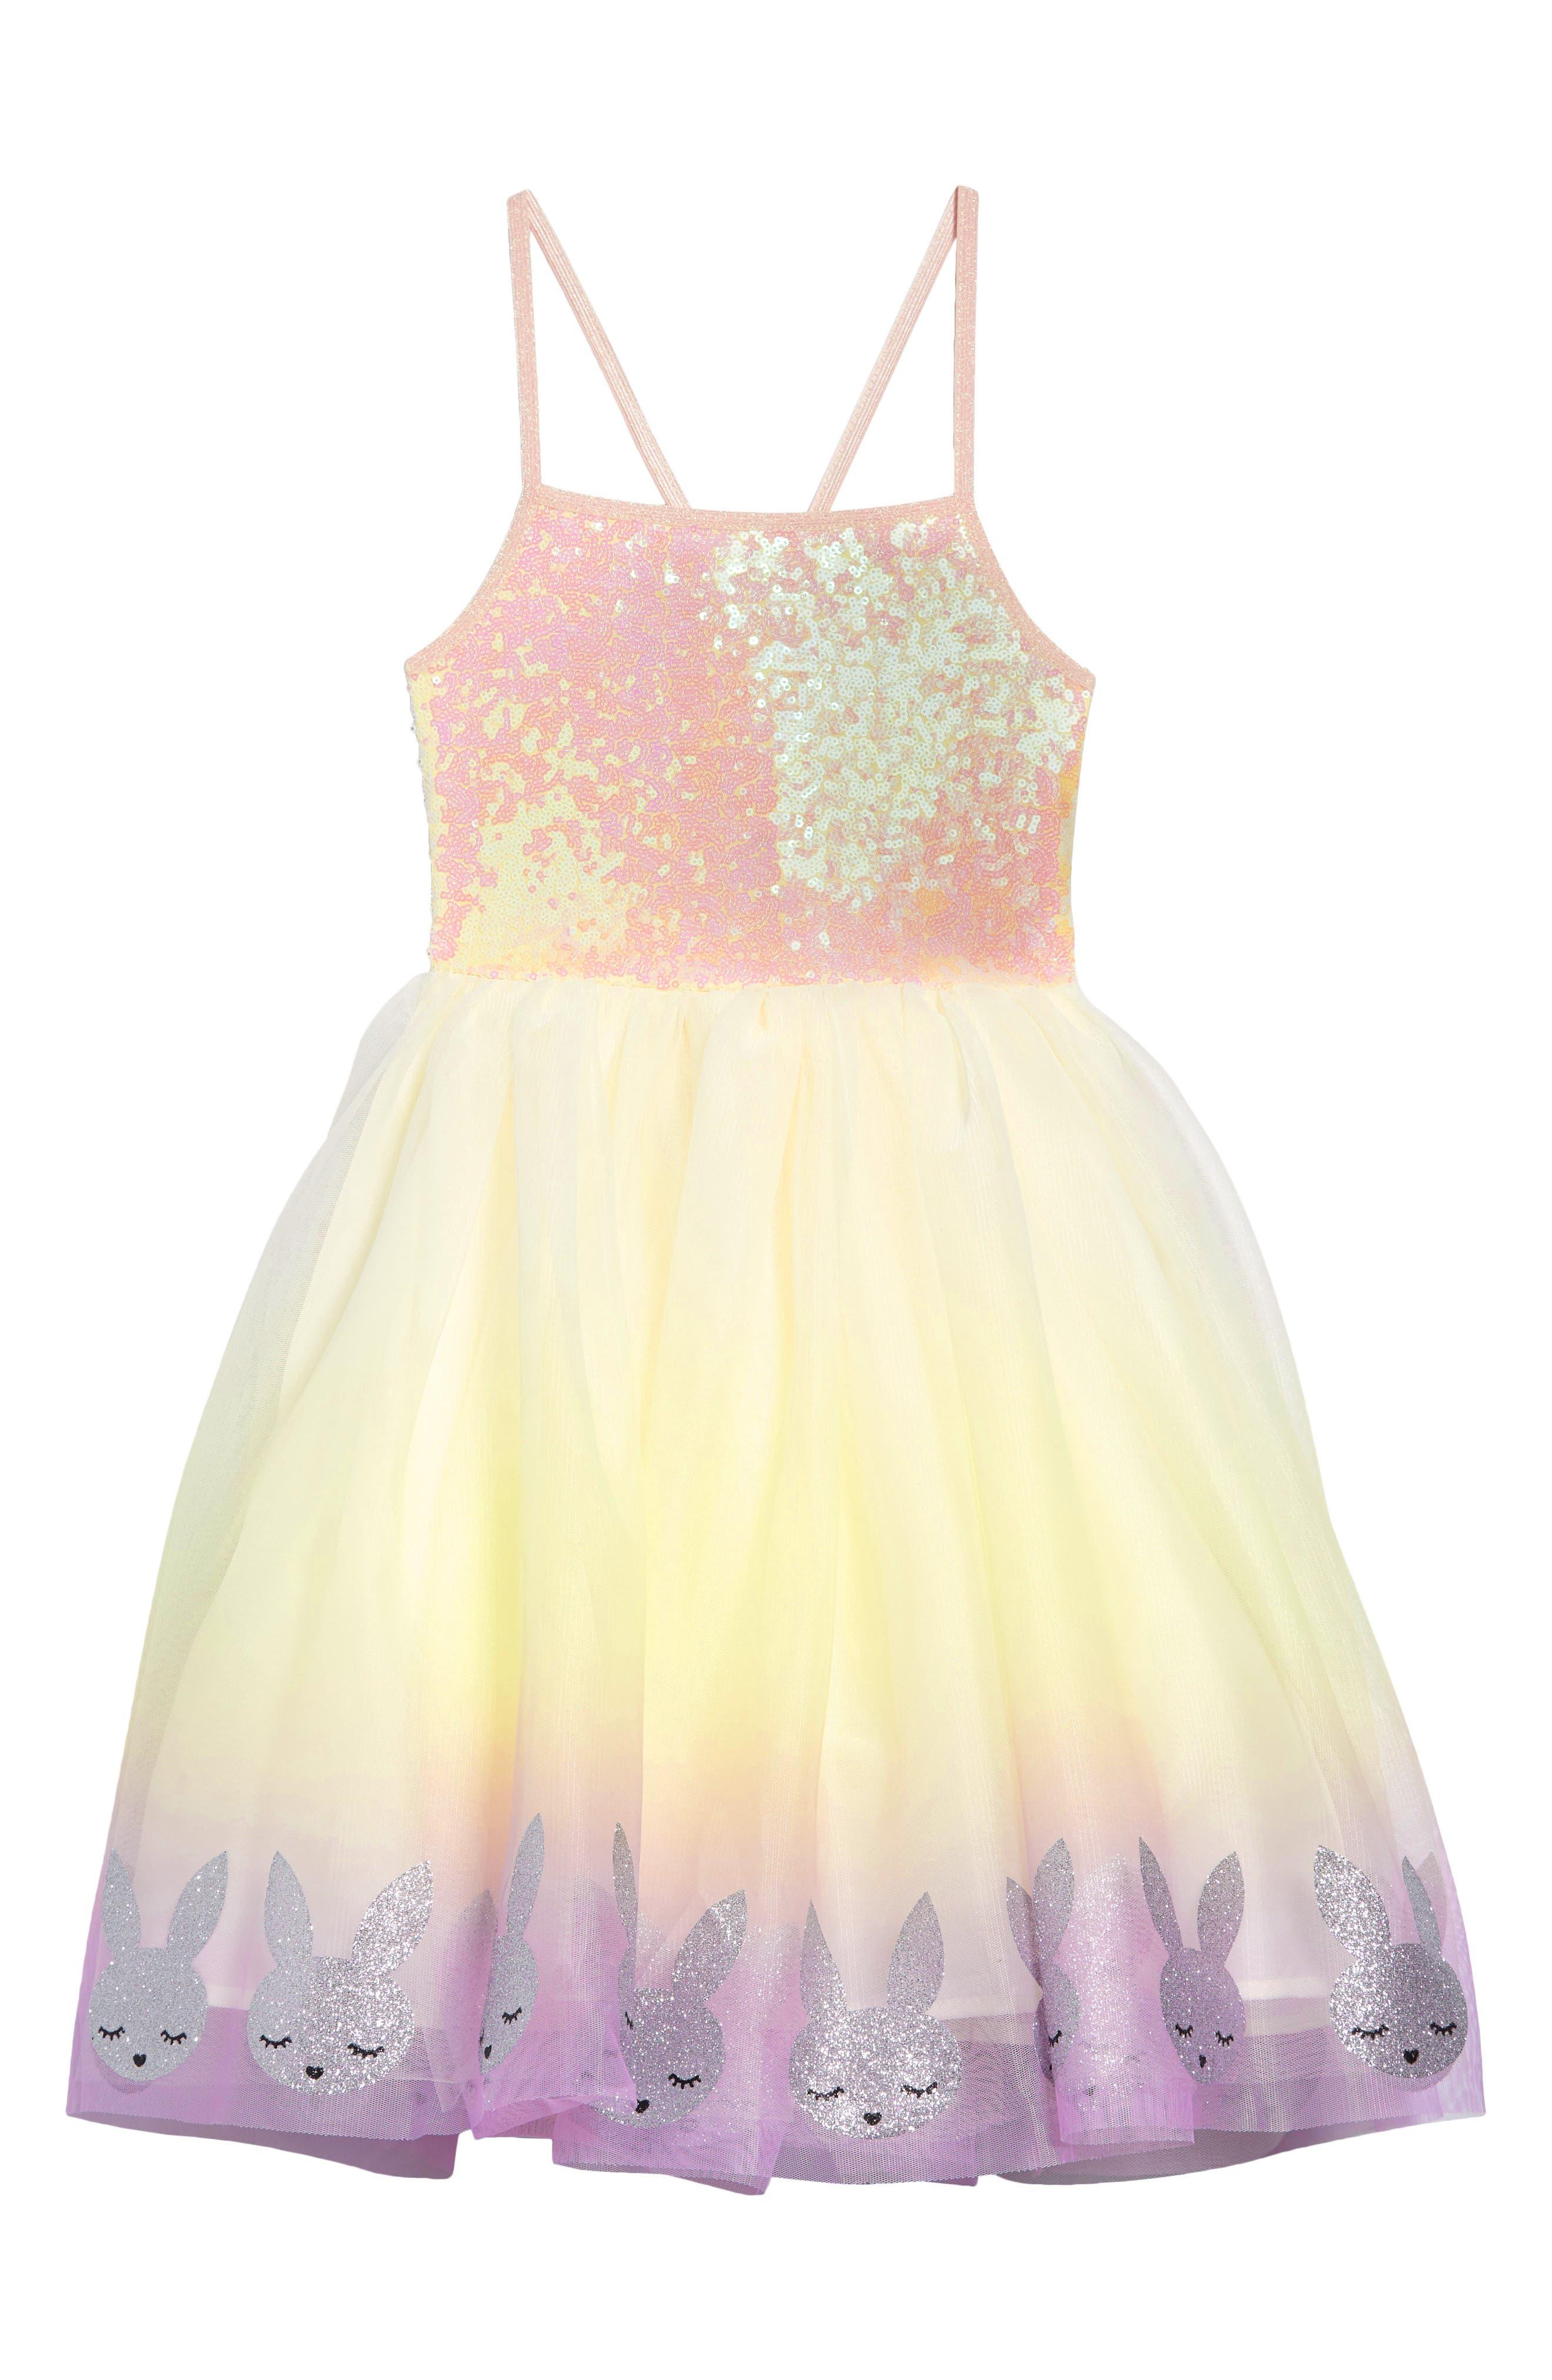 Baby Girls Gauze Cap Sleeve Dedication Dress Floral Empire Waist Baptism Outfit